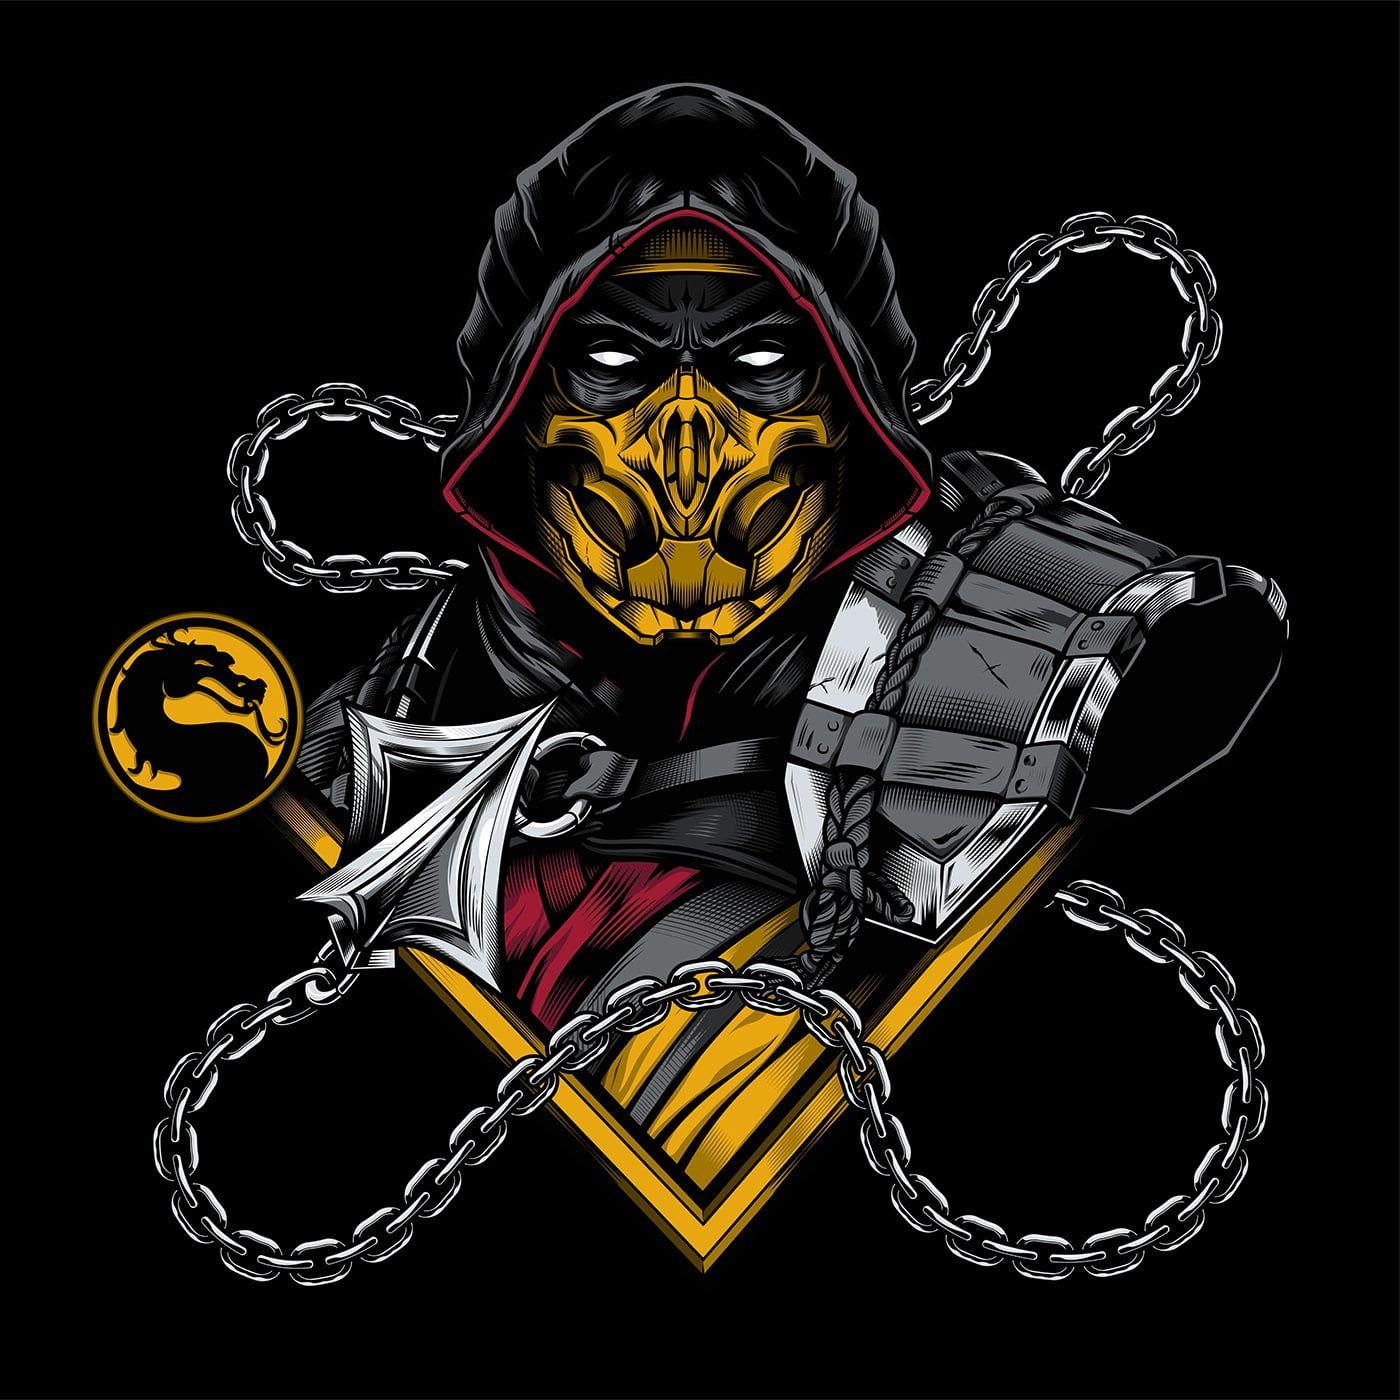 Mortal Kombat Video Games Scorpion 720p Wallpaper Hdwallpaper Desktop Mortal Kombat Art Scorpion Mortal Kombat Mortal Kombat Tattoo